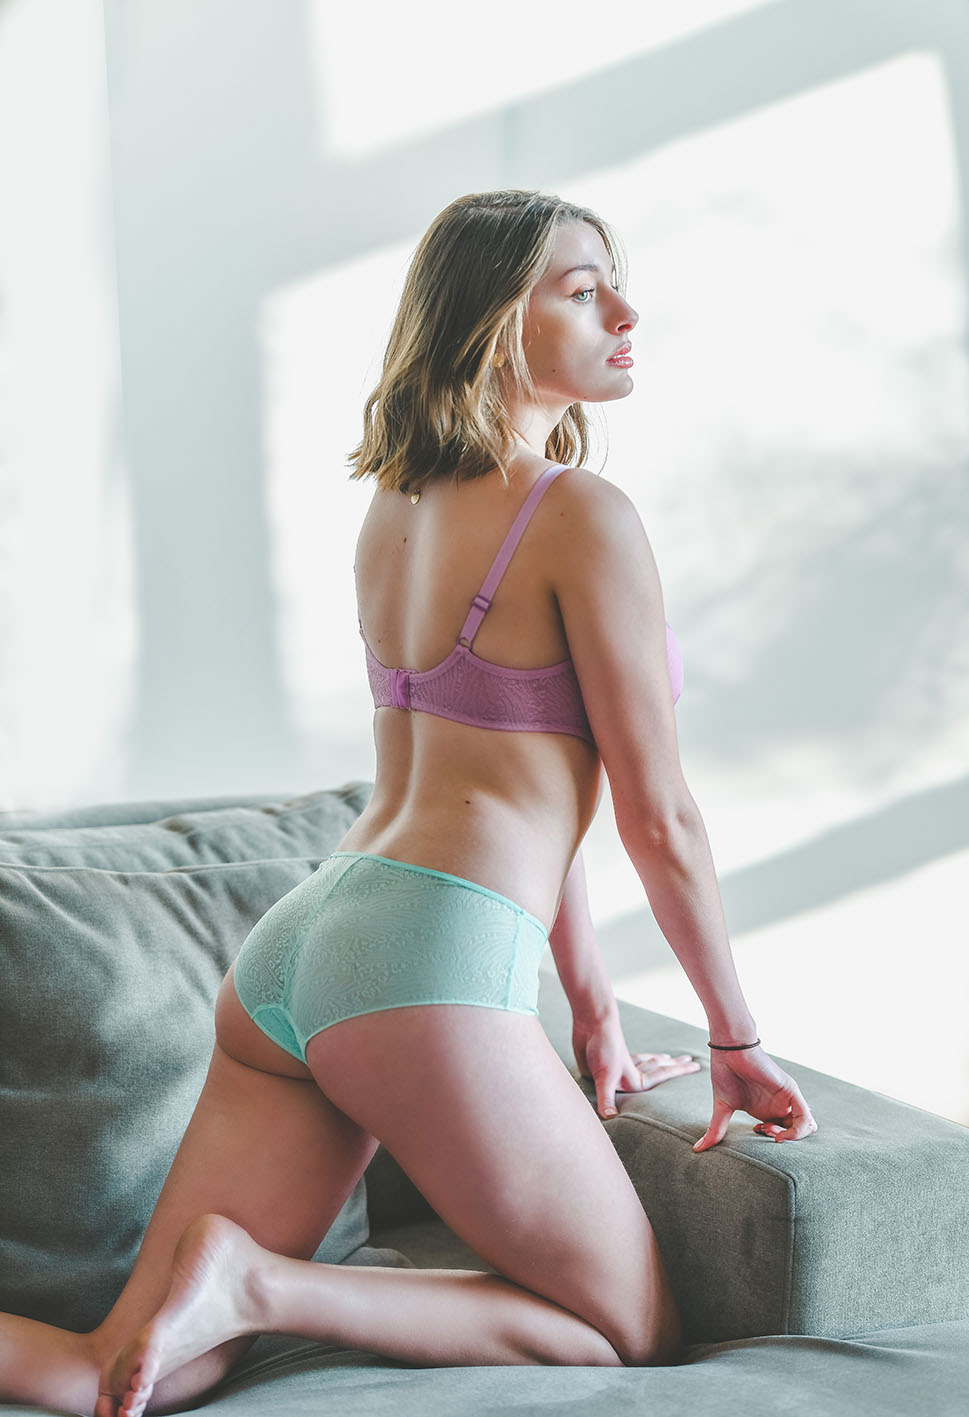 @lingerie-Leel-photographe-laurent-scavone-cr